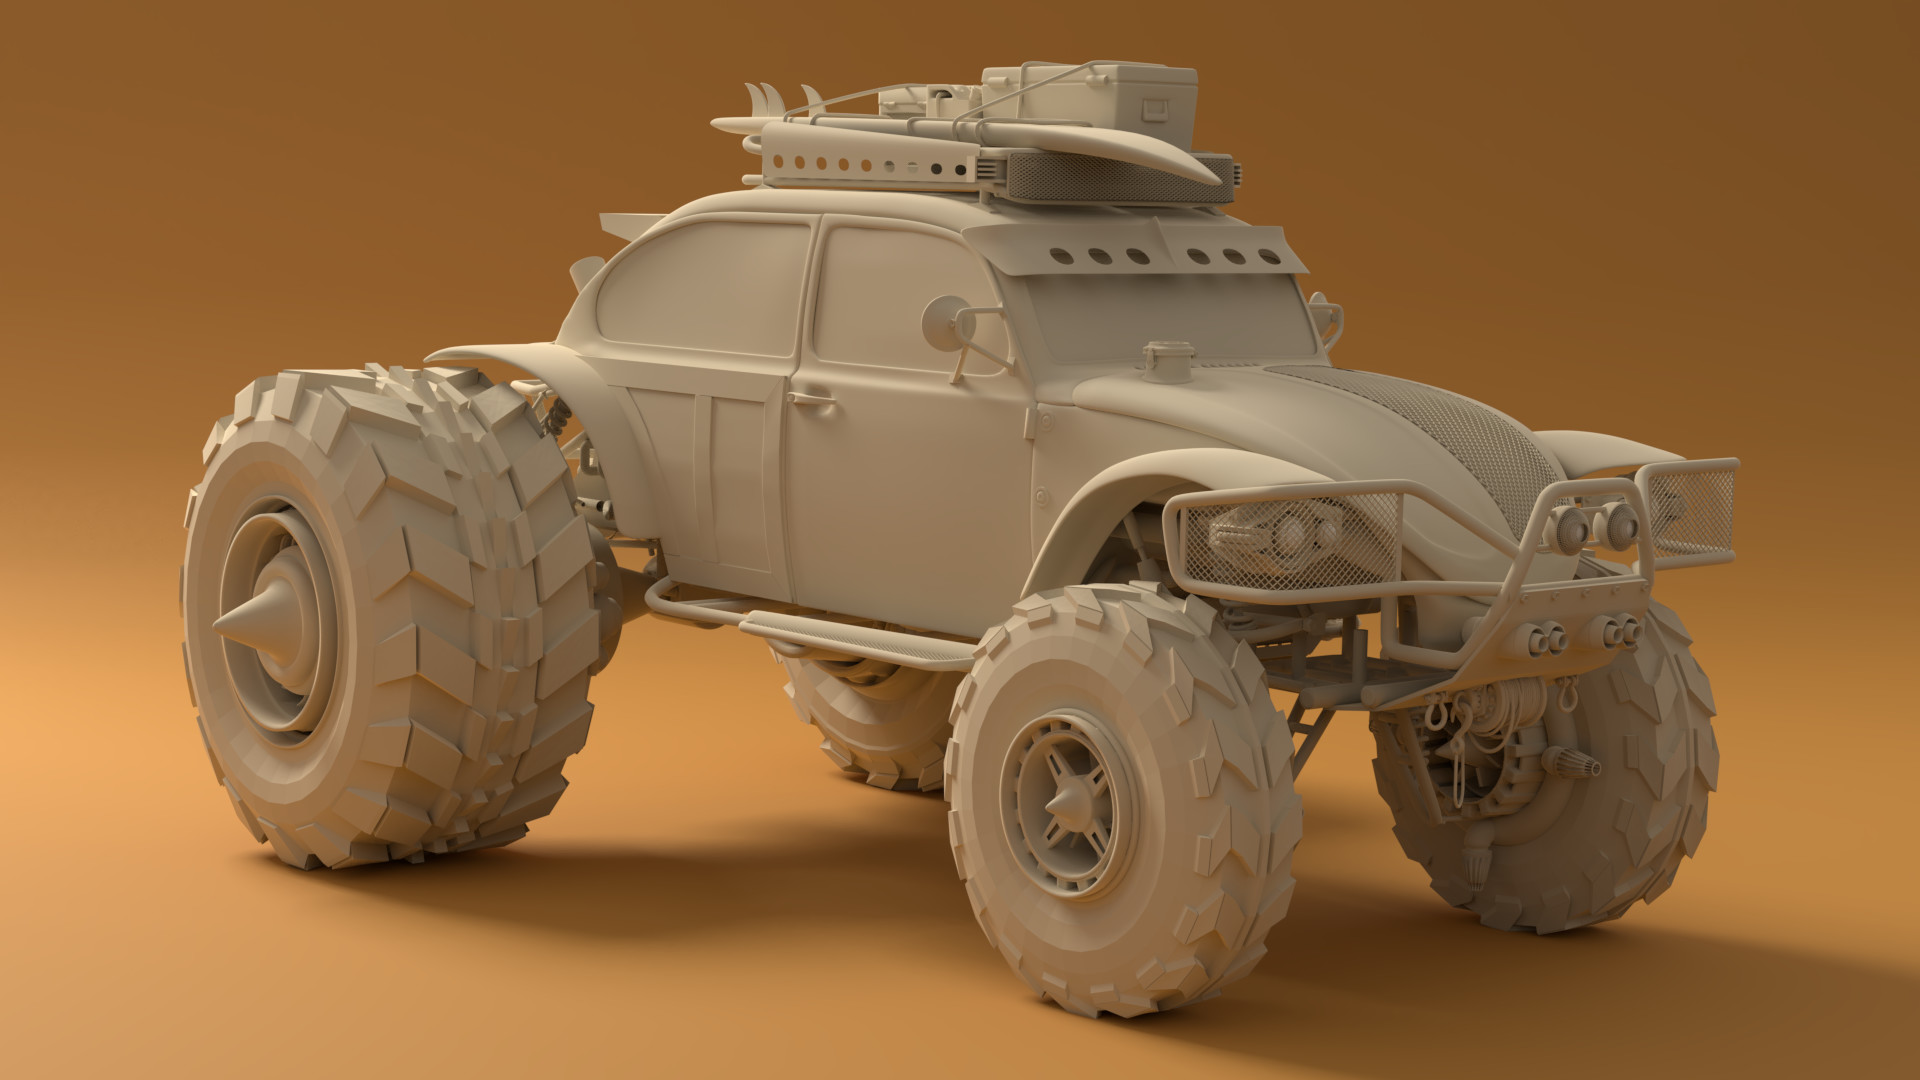 Baja Space Bug clay